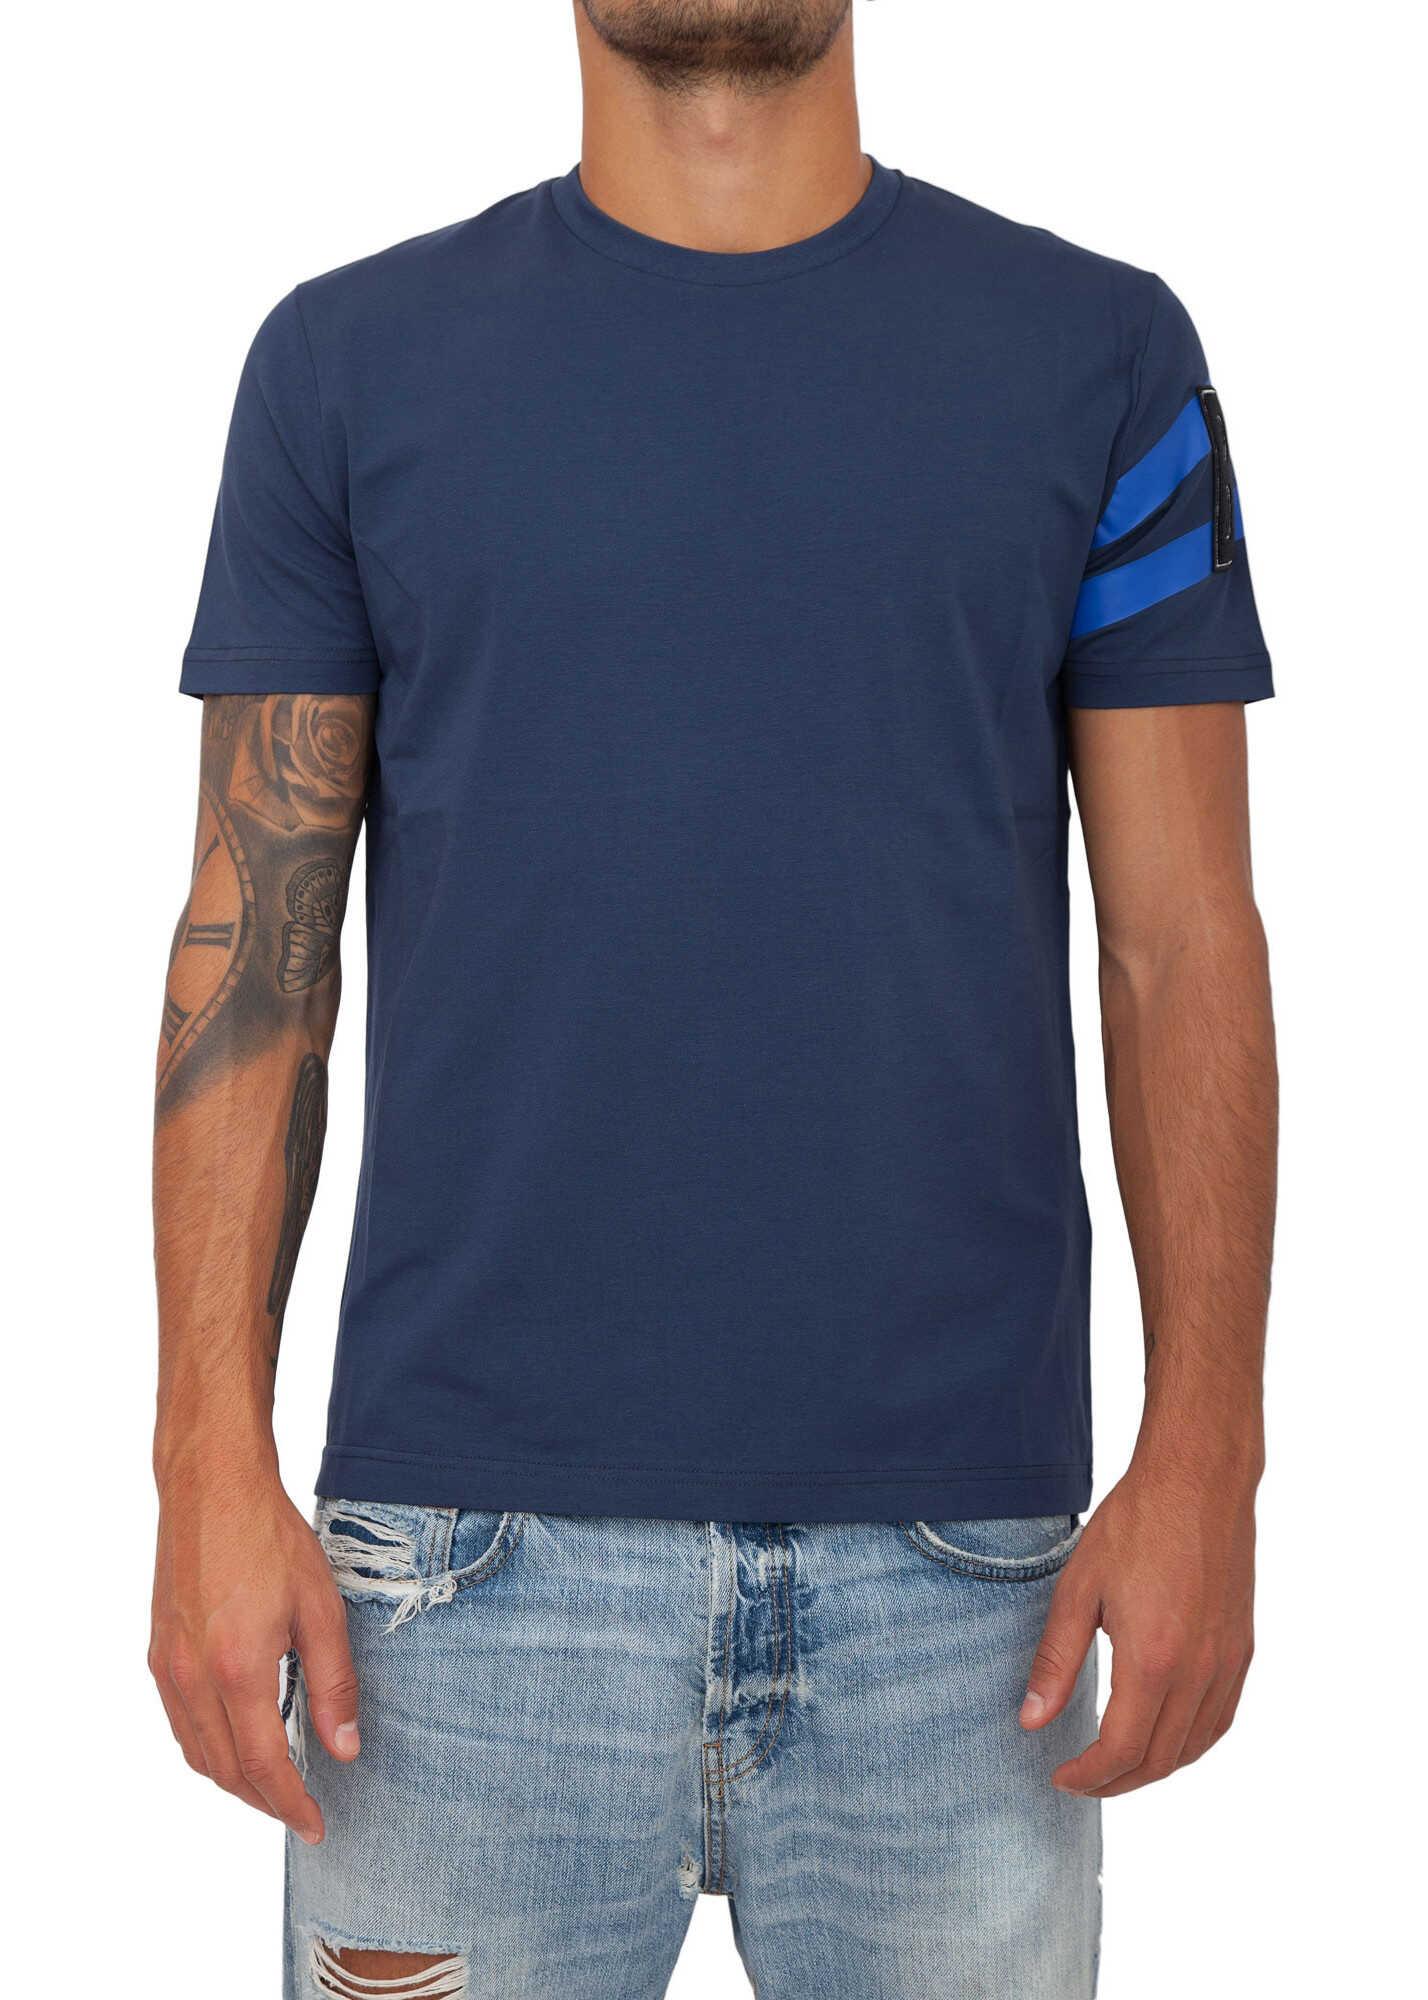 BIKKEMBERGS T-Shirt* BLUE